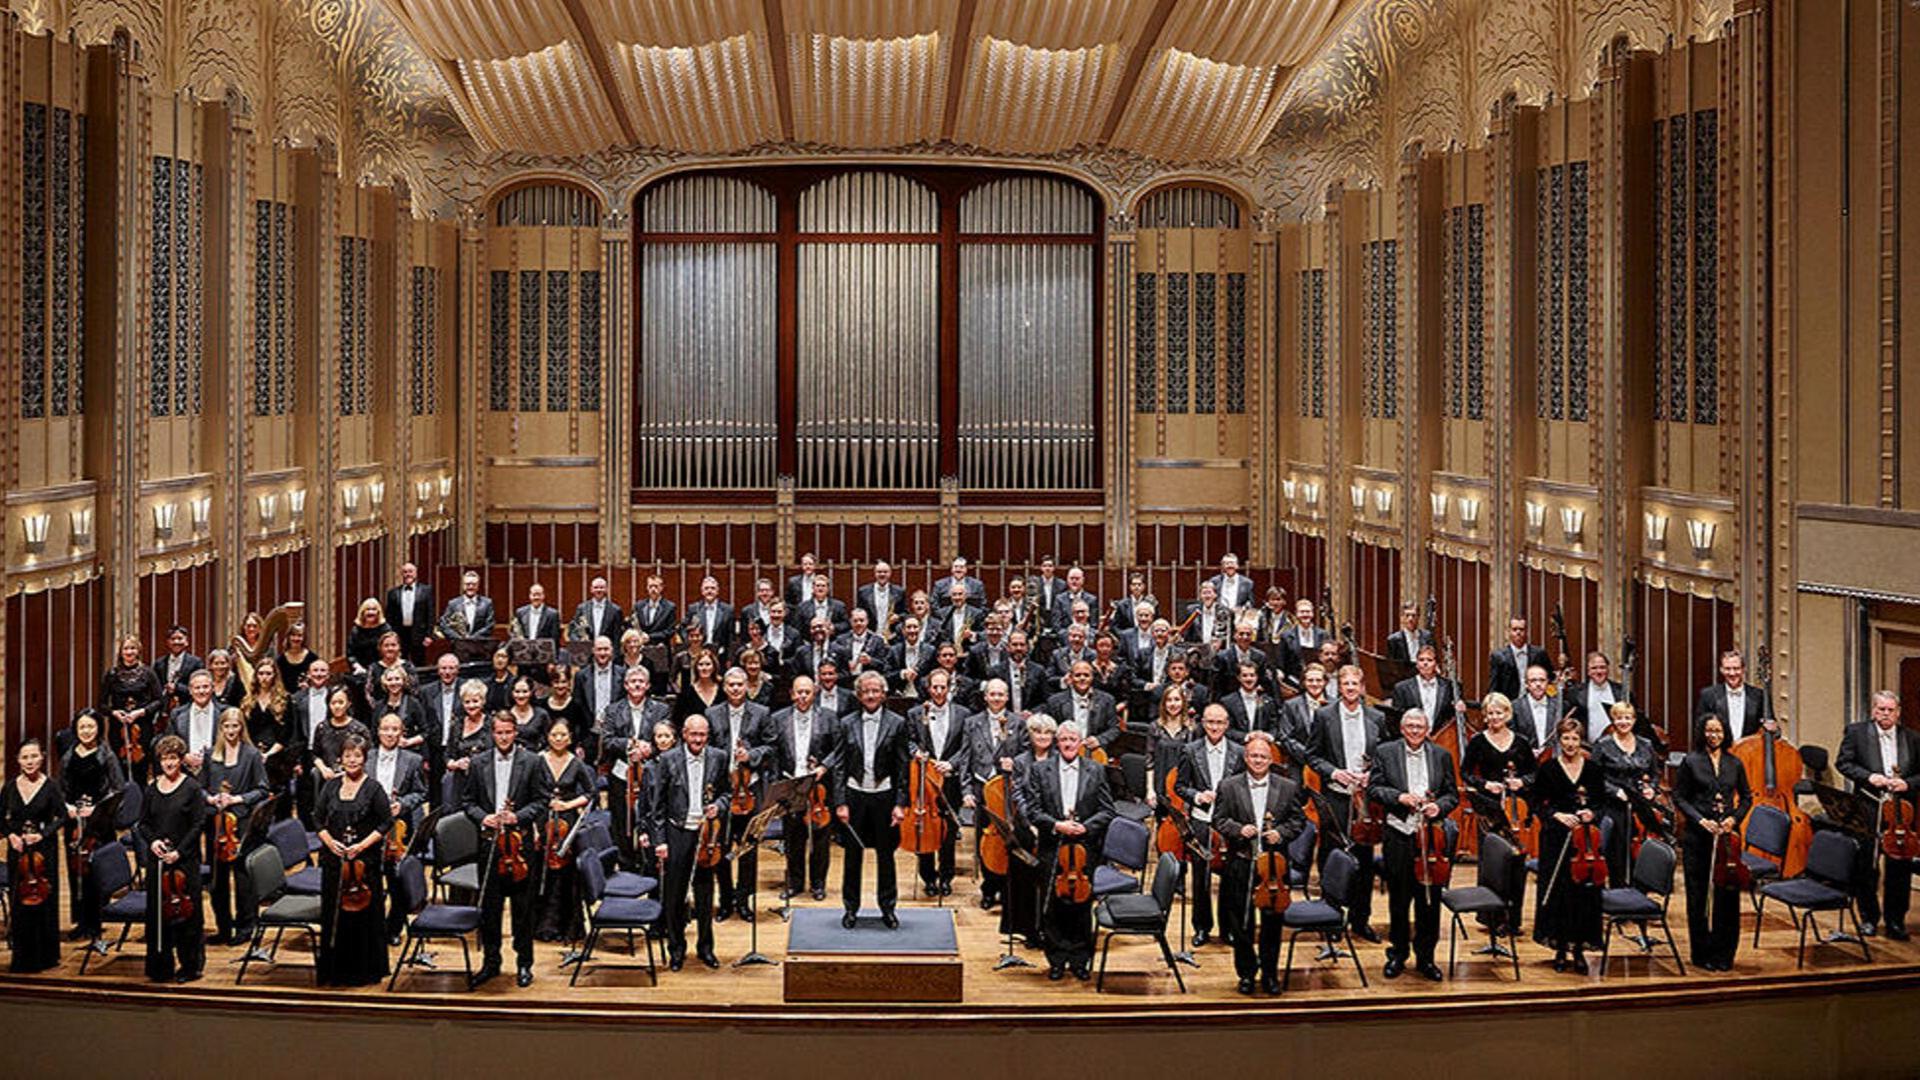 The Cleveland Orchestra / Photo credit: Roger Mastroianni